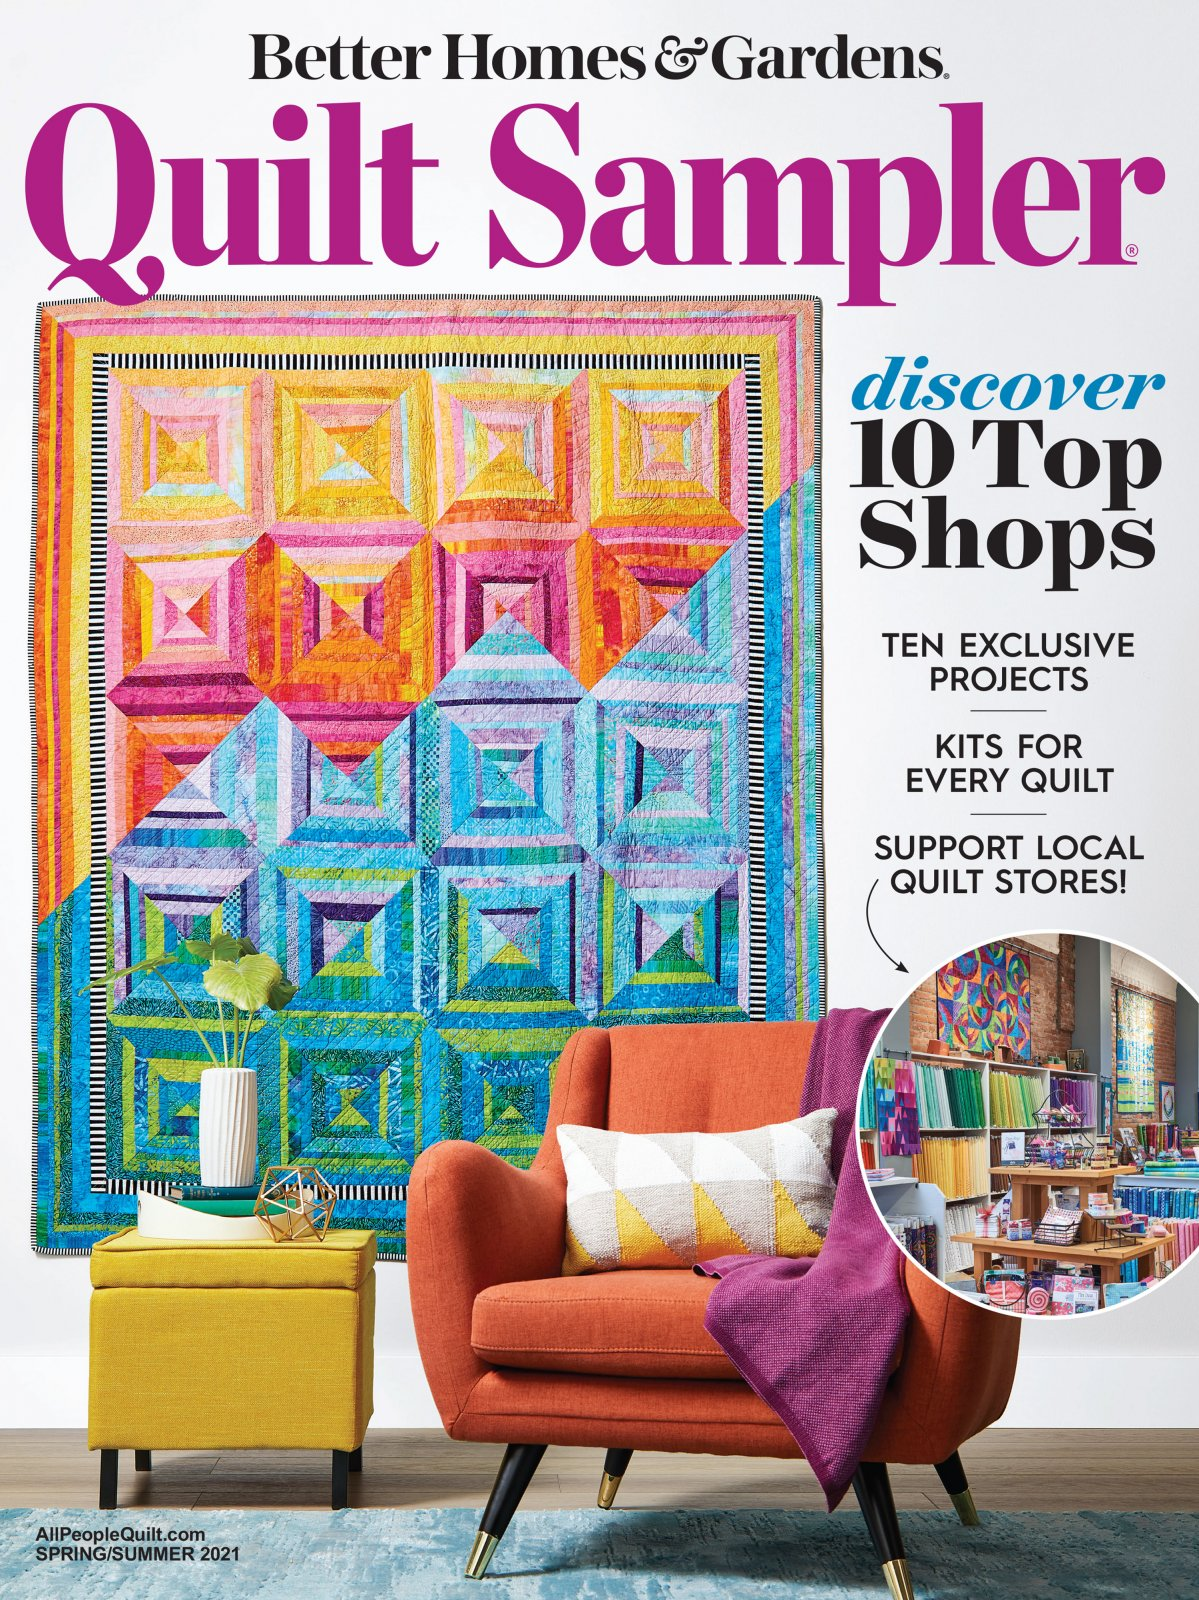 Quilt Sampler Magazine Spring/Summer 2021